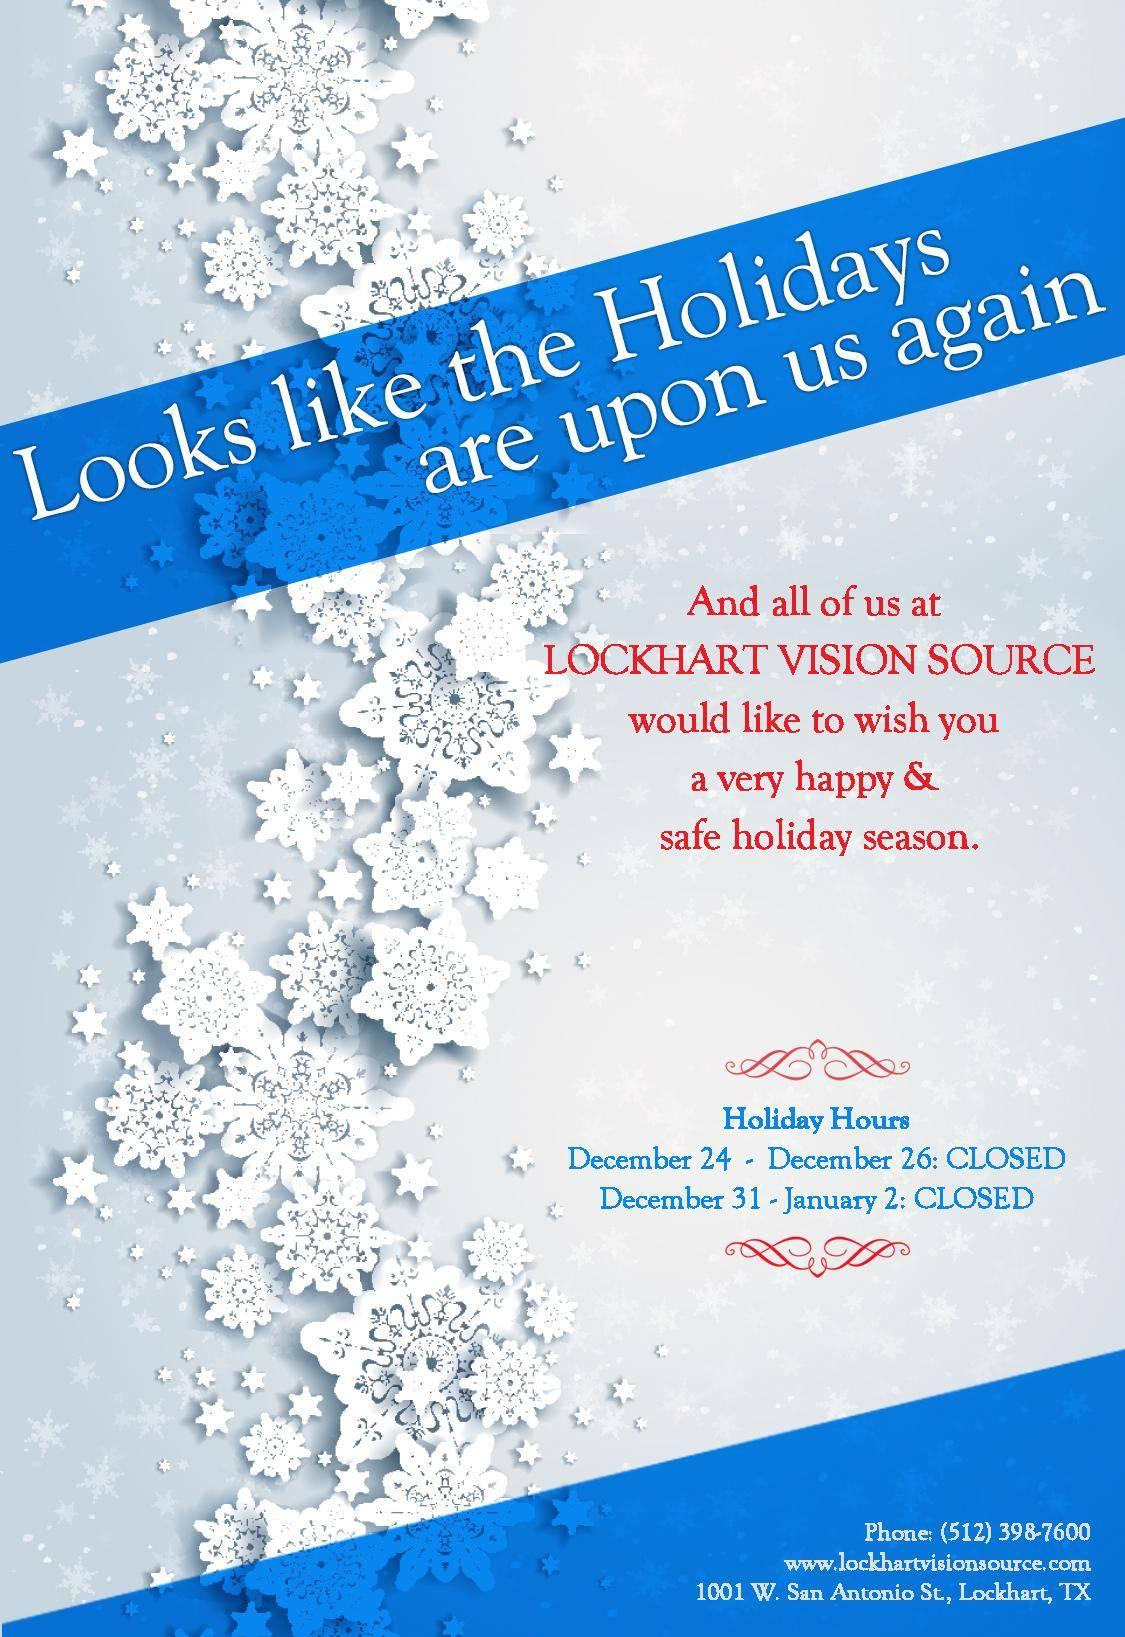 HolidayHoursSnowflake PrintMe 1 page 001